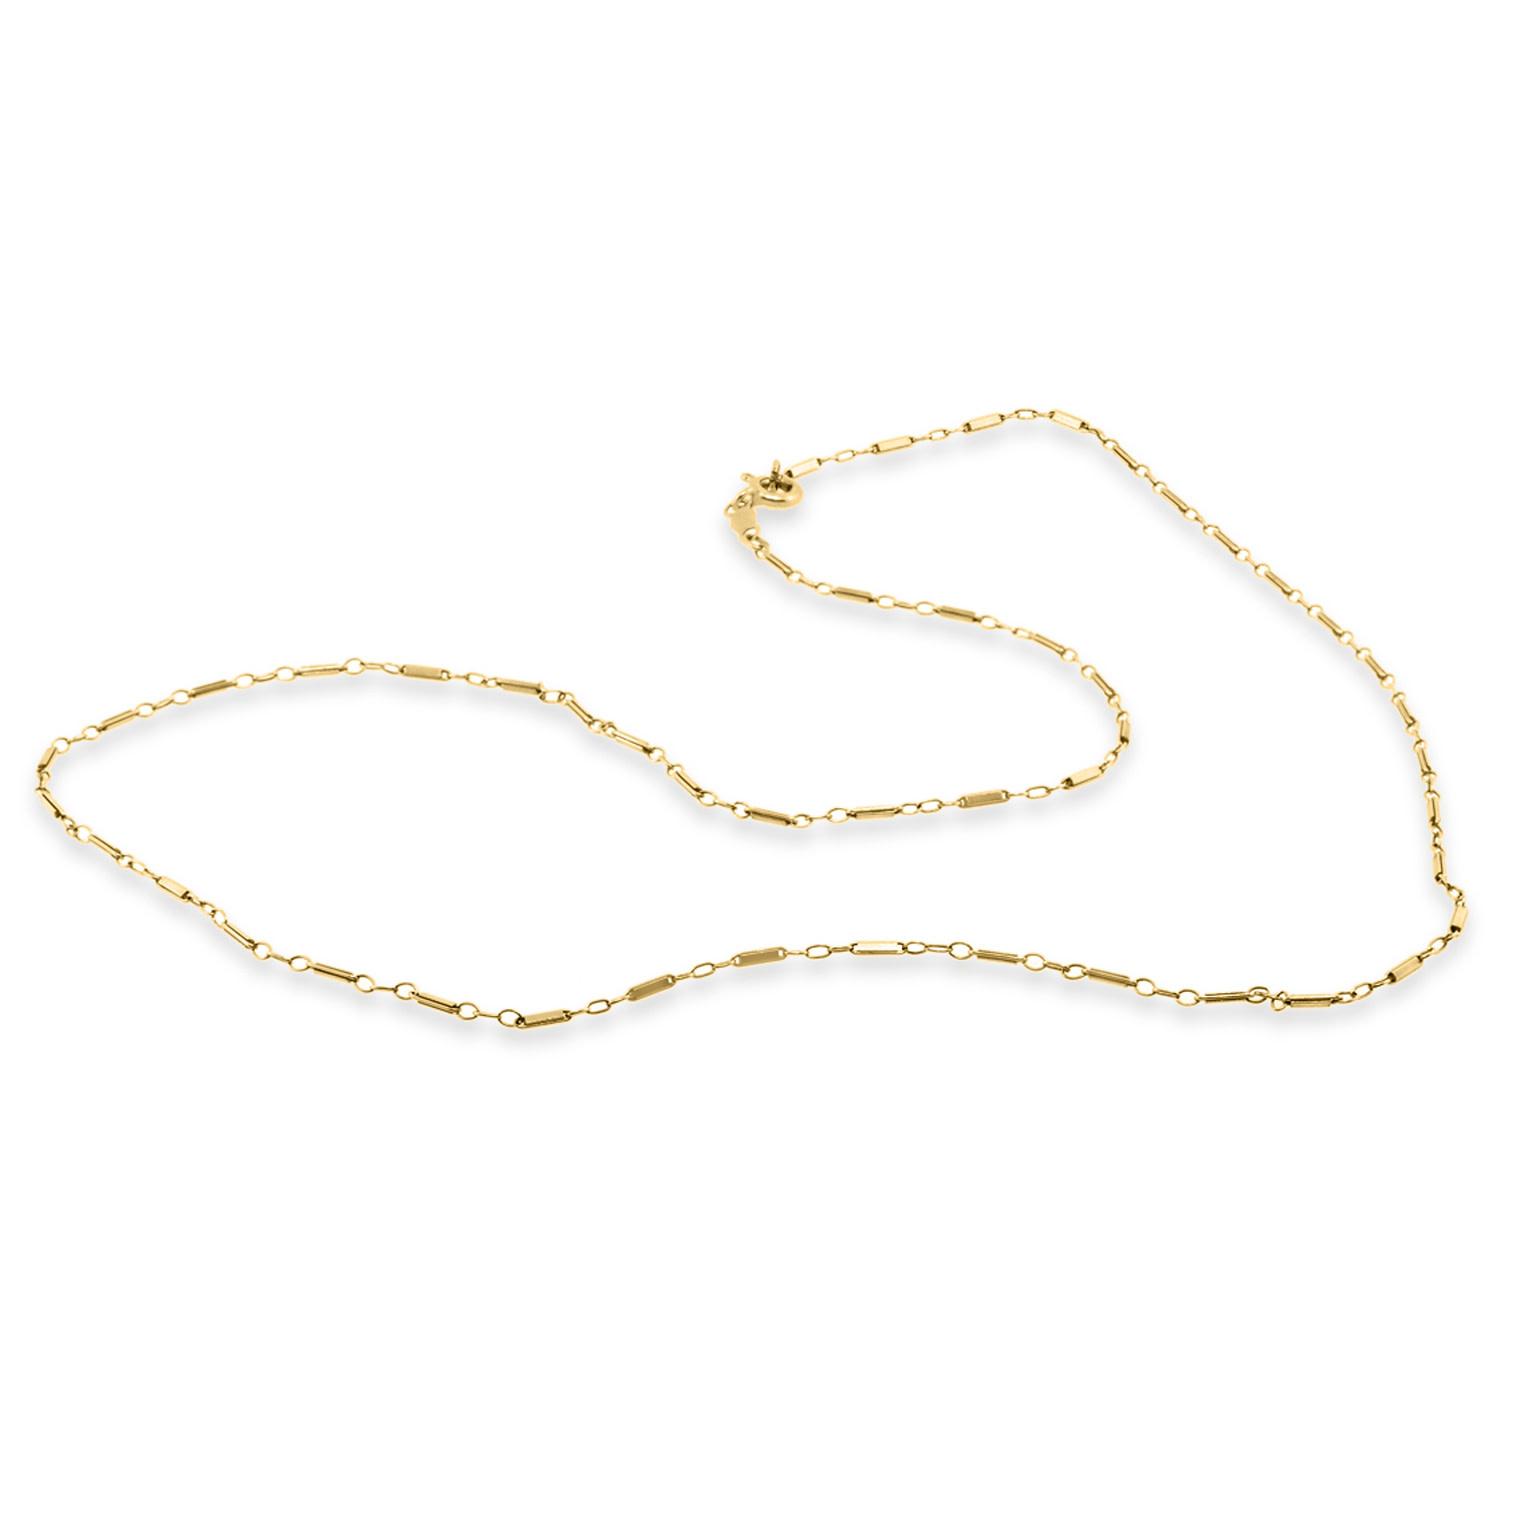 Trabert Goldsmiths Vintage Bar Link Yellow Gold Necklace